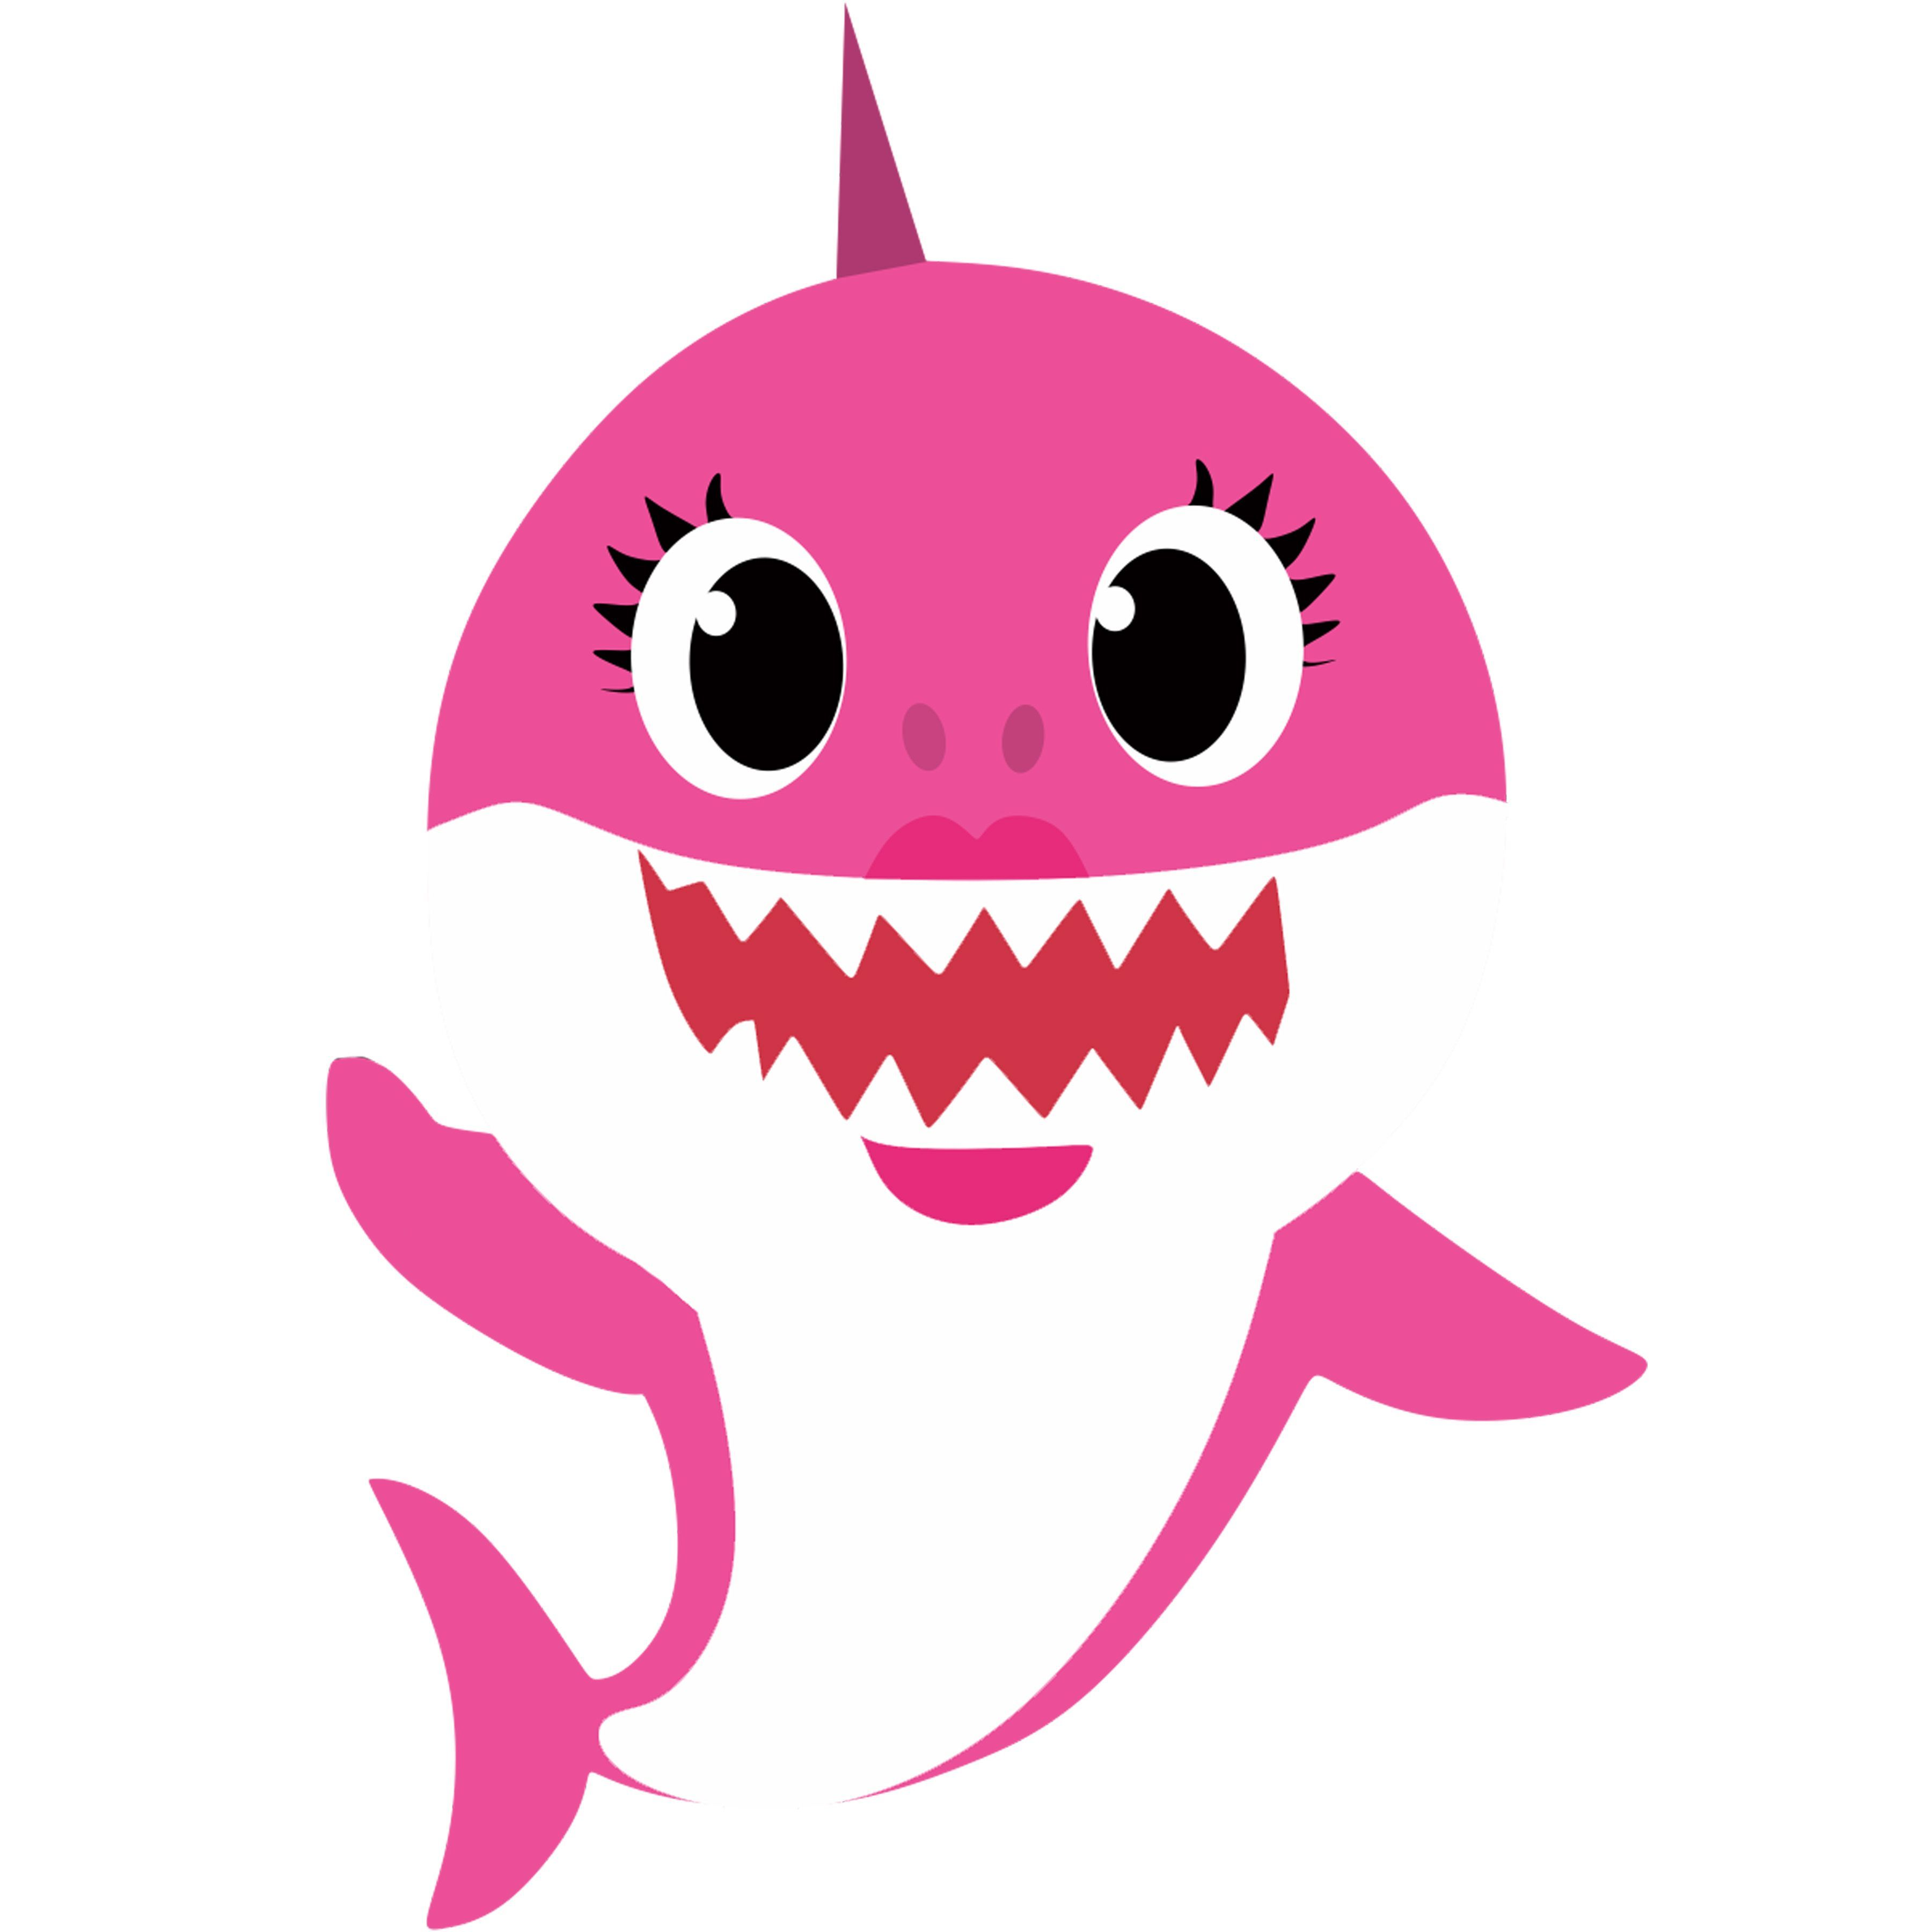 davids diy image by Barbara Gilliam Baby shark, Shark